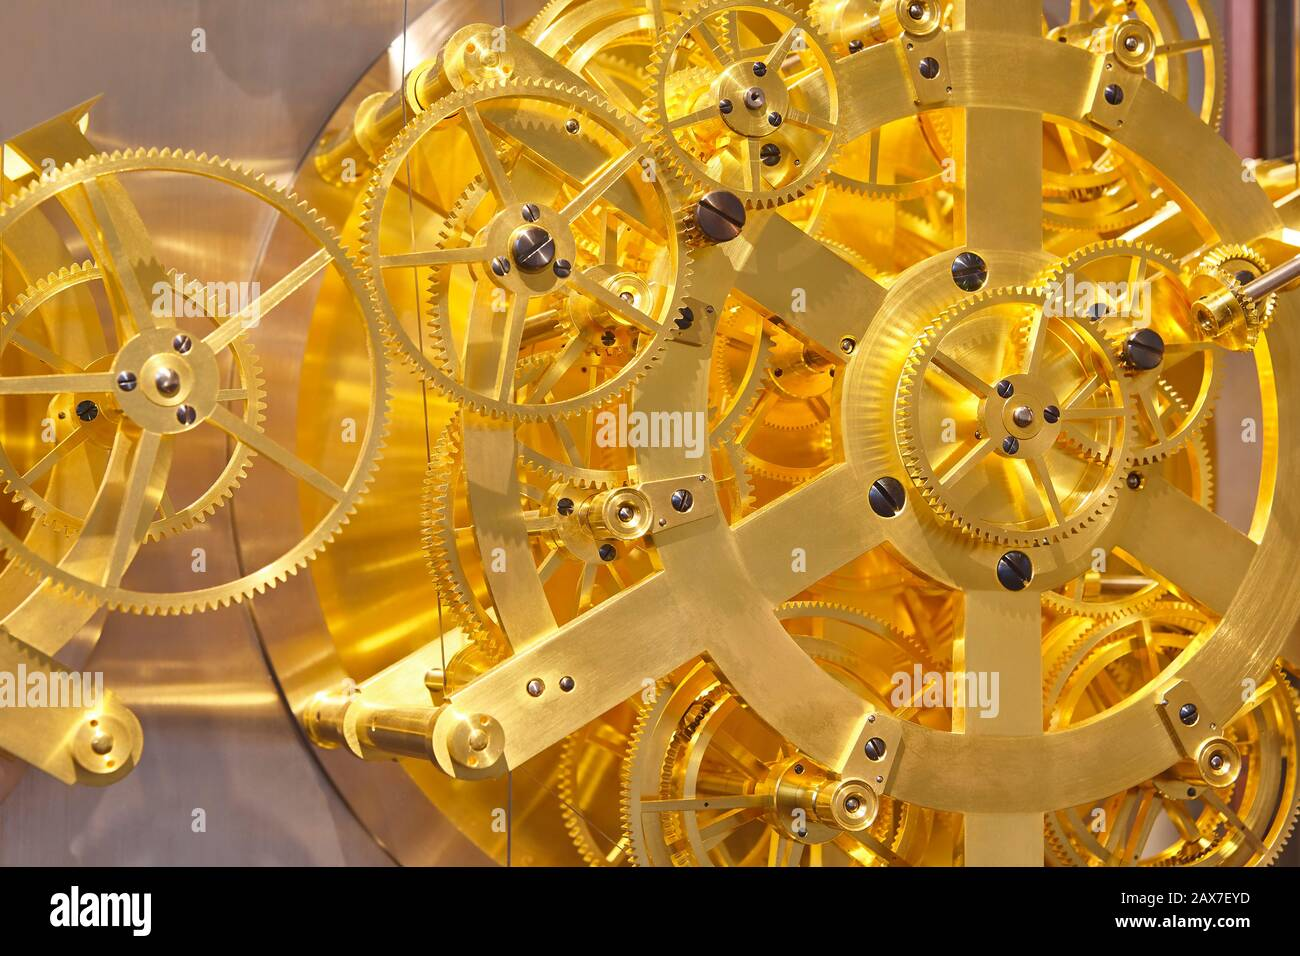 Clockwork mechanism detail. Jen Olsen world clock. Copenhague, Denmark Stock Photo